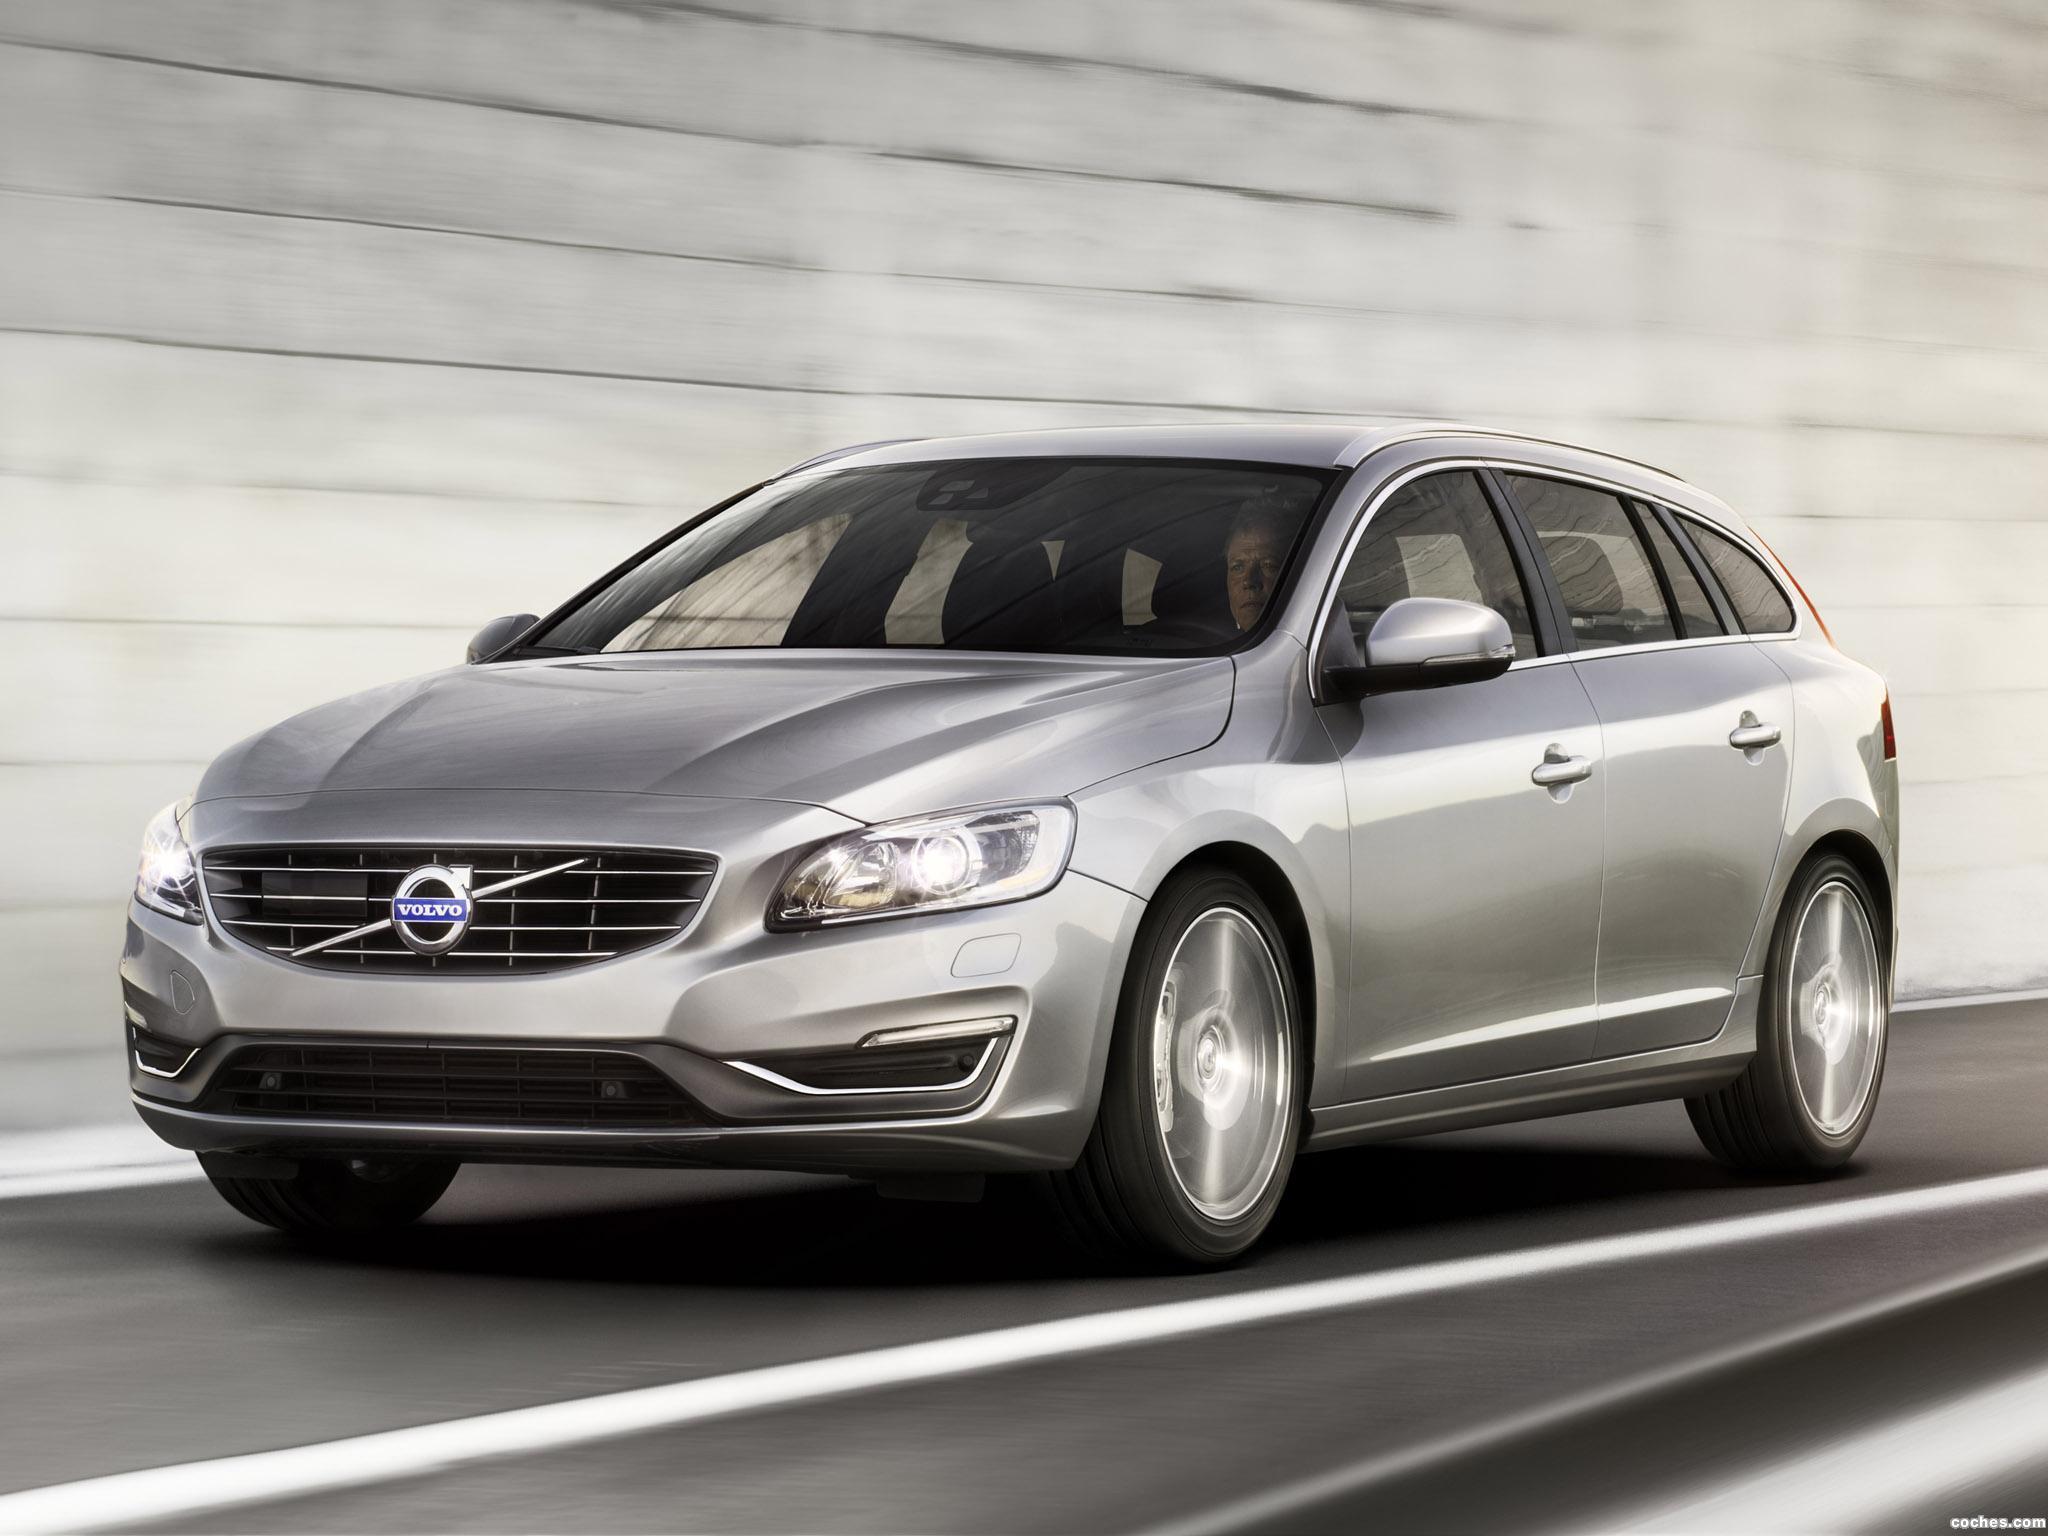 Foto 1 de Volvo V60 2013